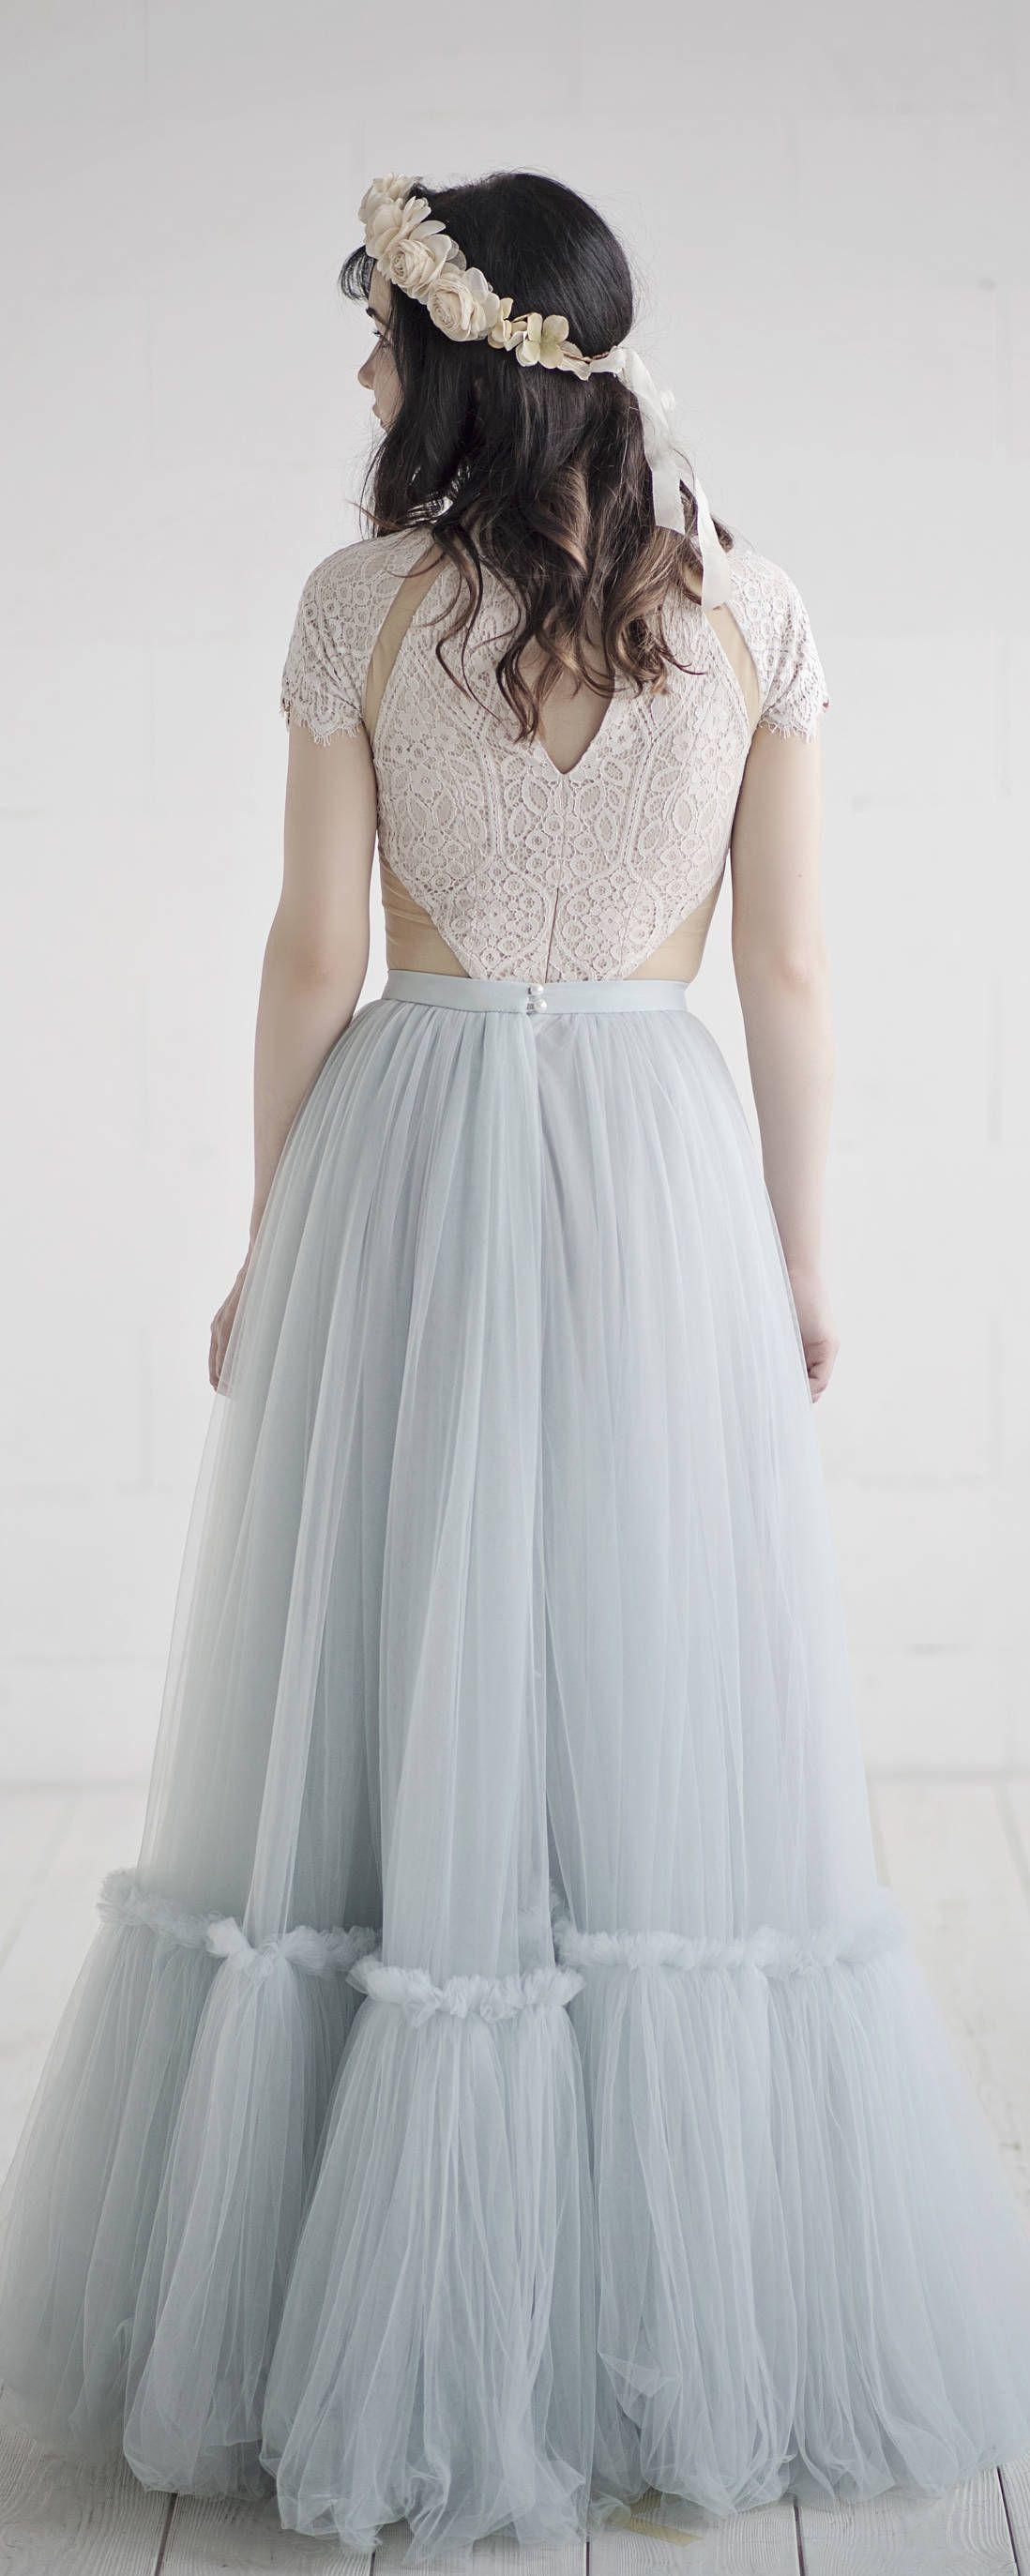 Dolores bohemian wedding dress boho bridal gown rustic wedding